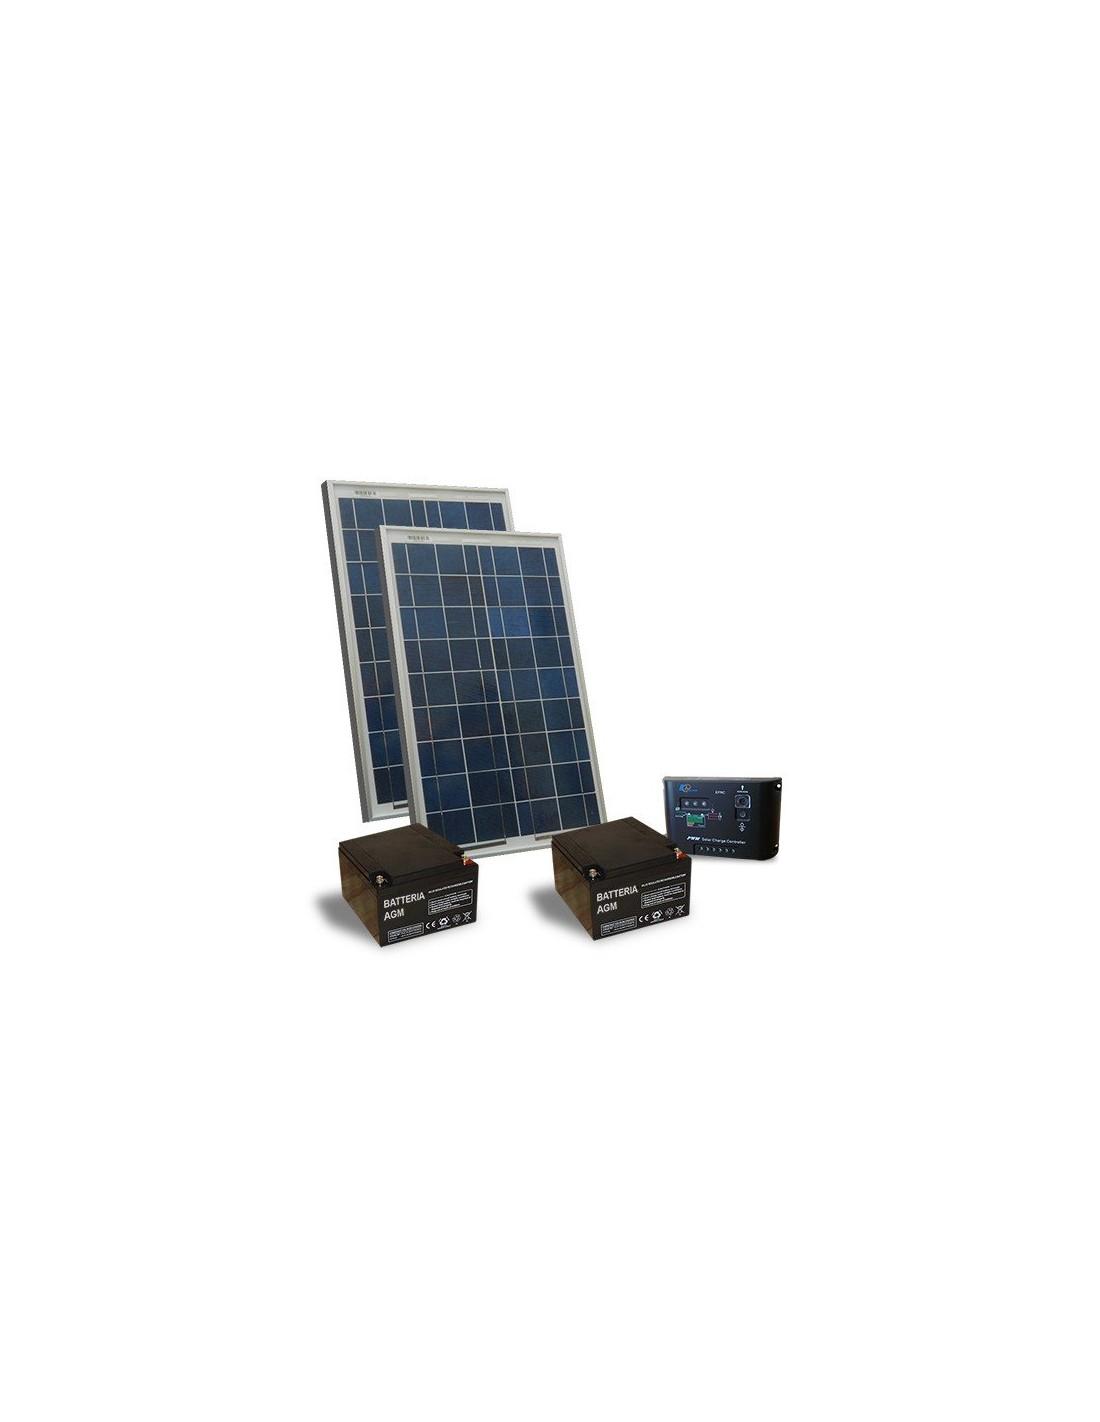 Schema Elettrico Regolatore Di Carica Per Pannelli Solari : Wrm regolatore di carica a v western mppt